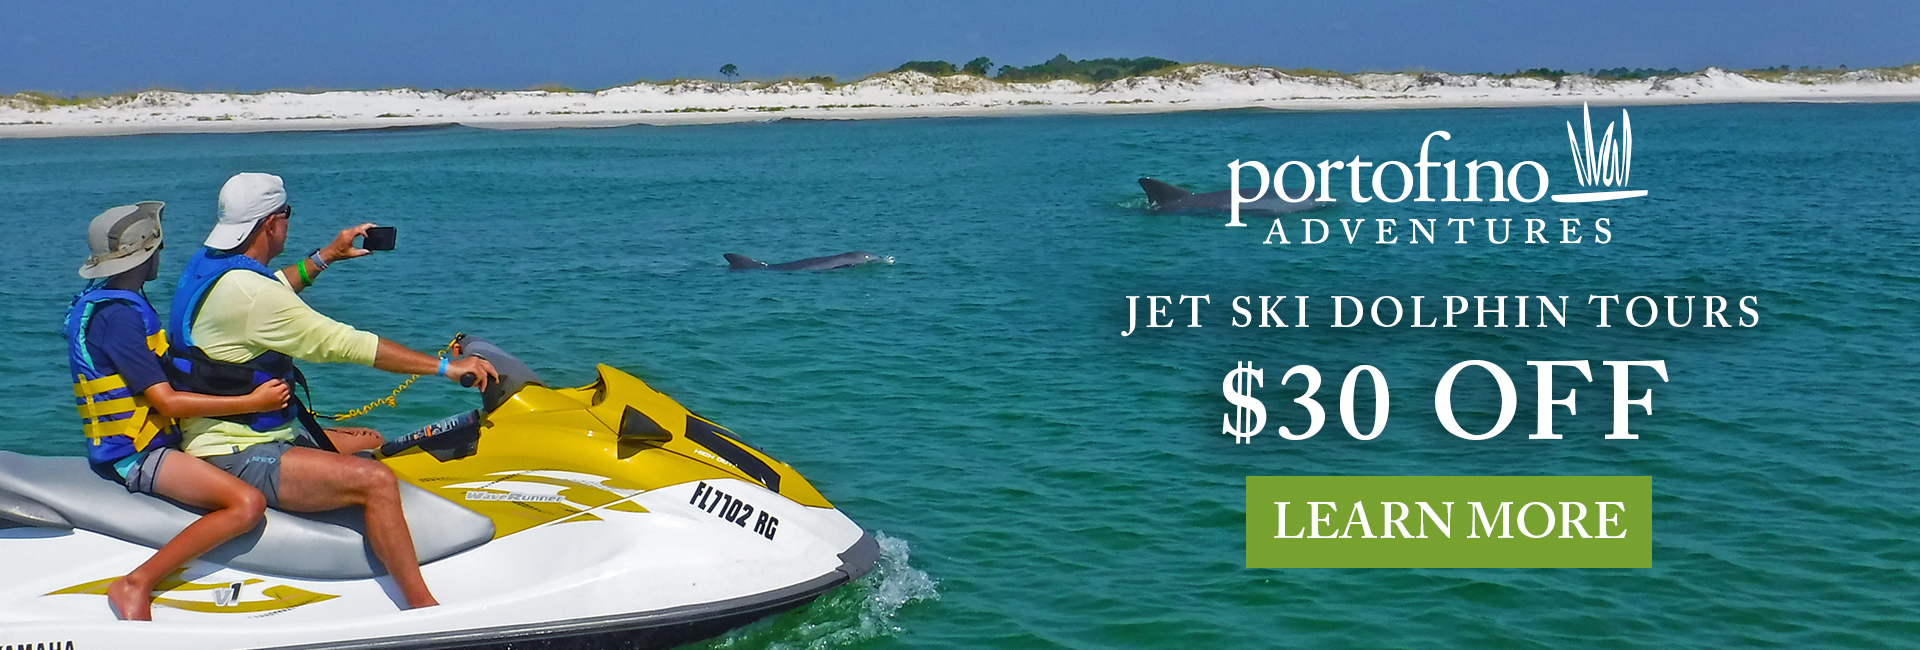 Jet ski dolphin tours in the sound